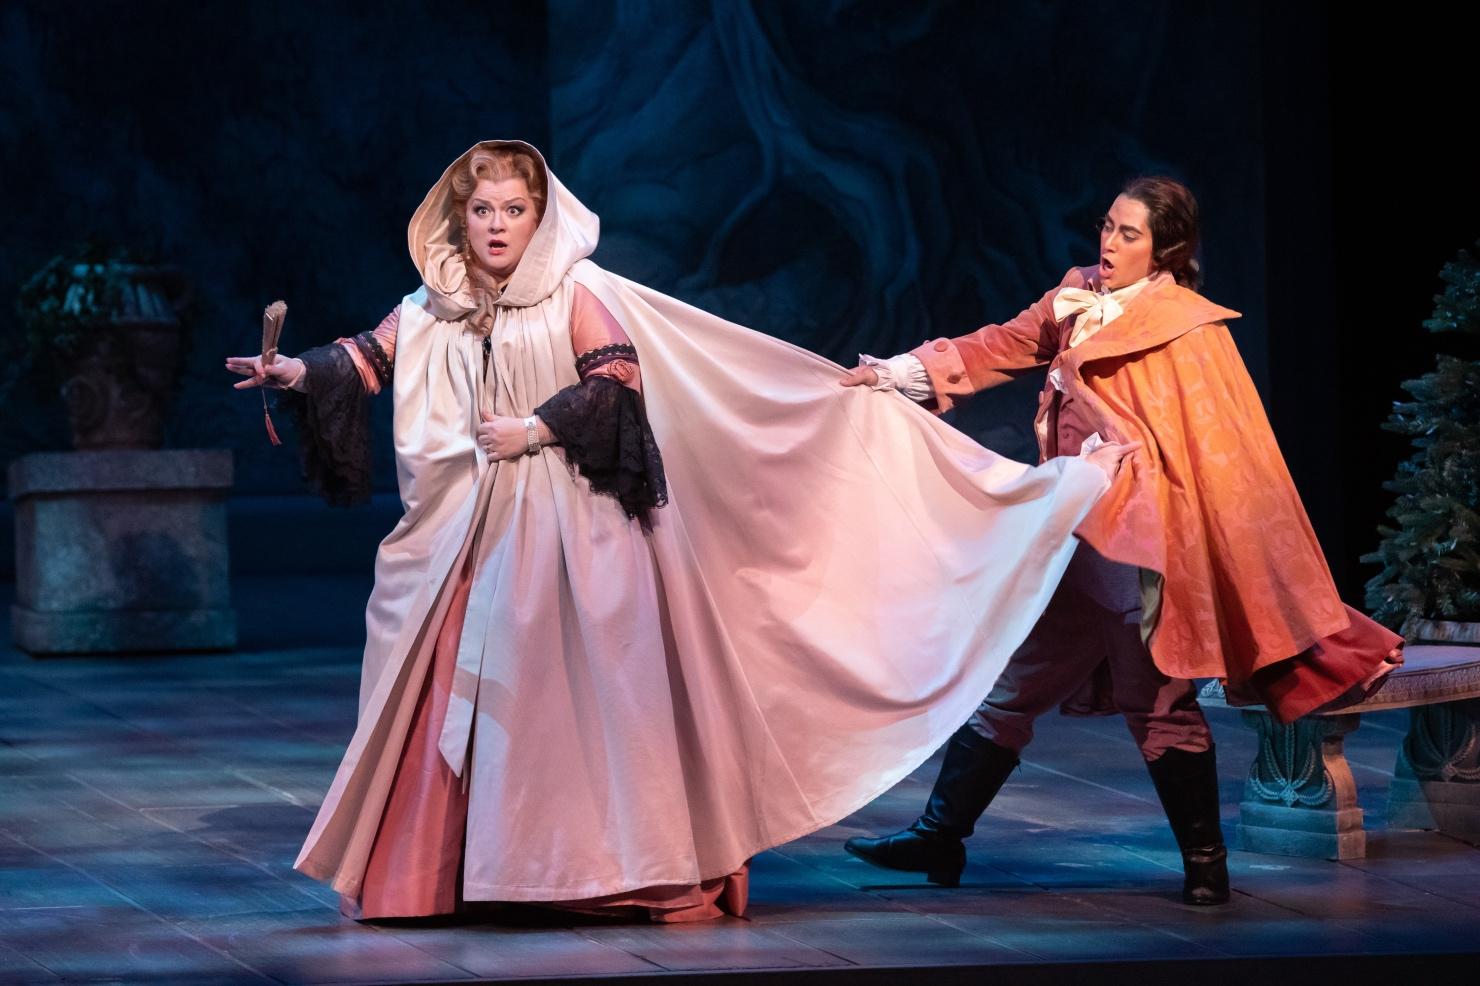 stage opera classical performance Mozart Florida Petrova soprano singing costumes